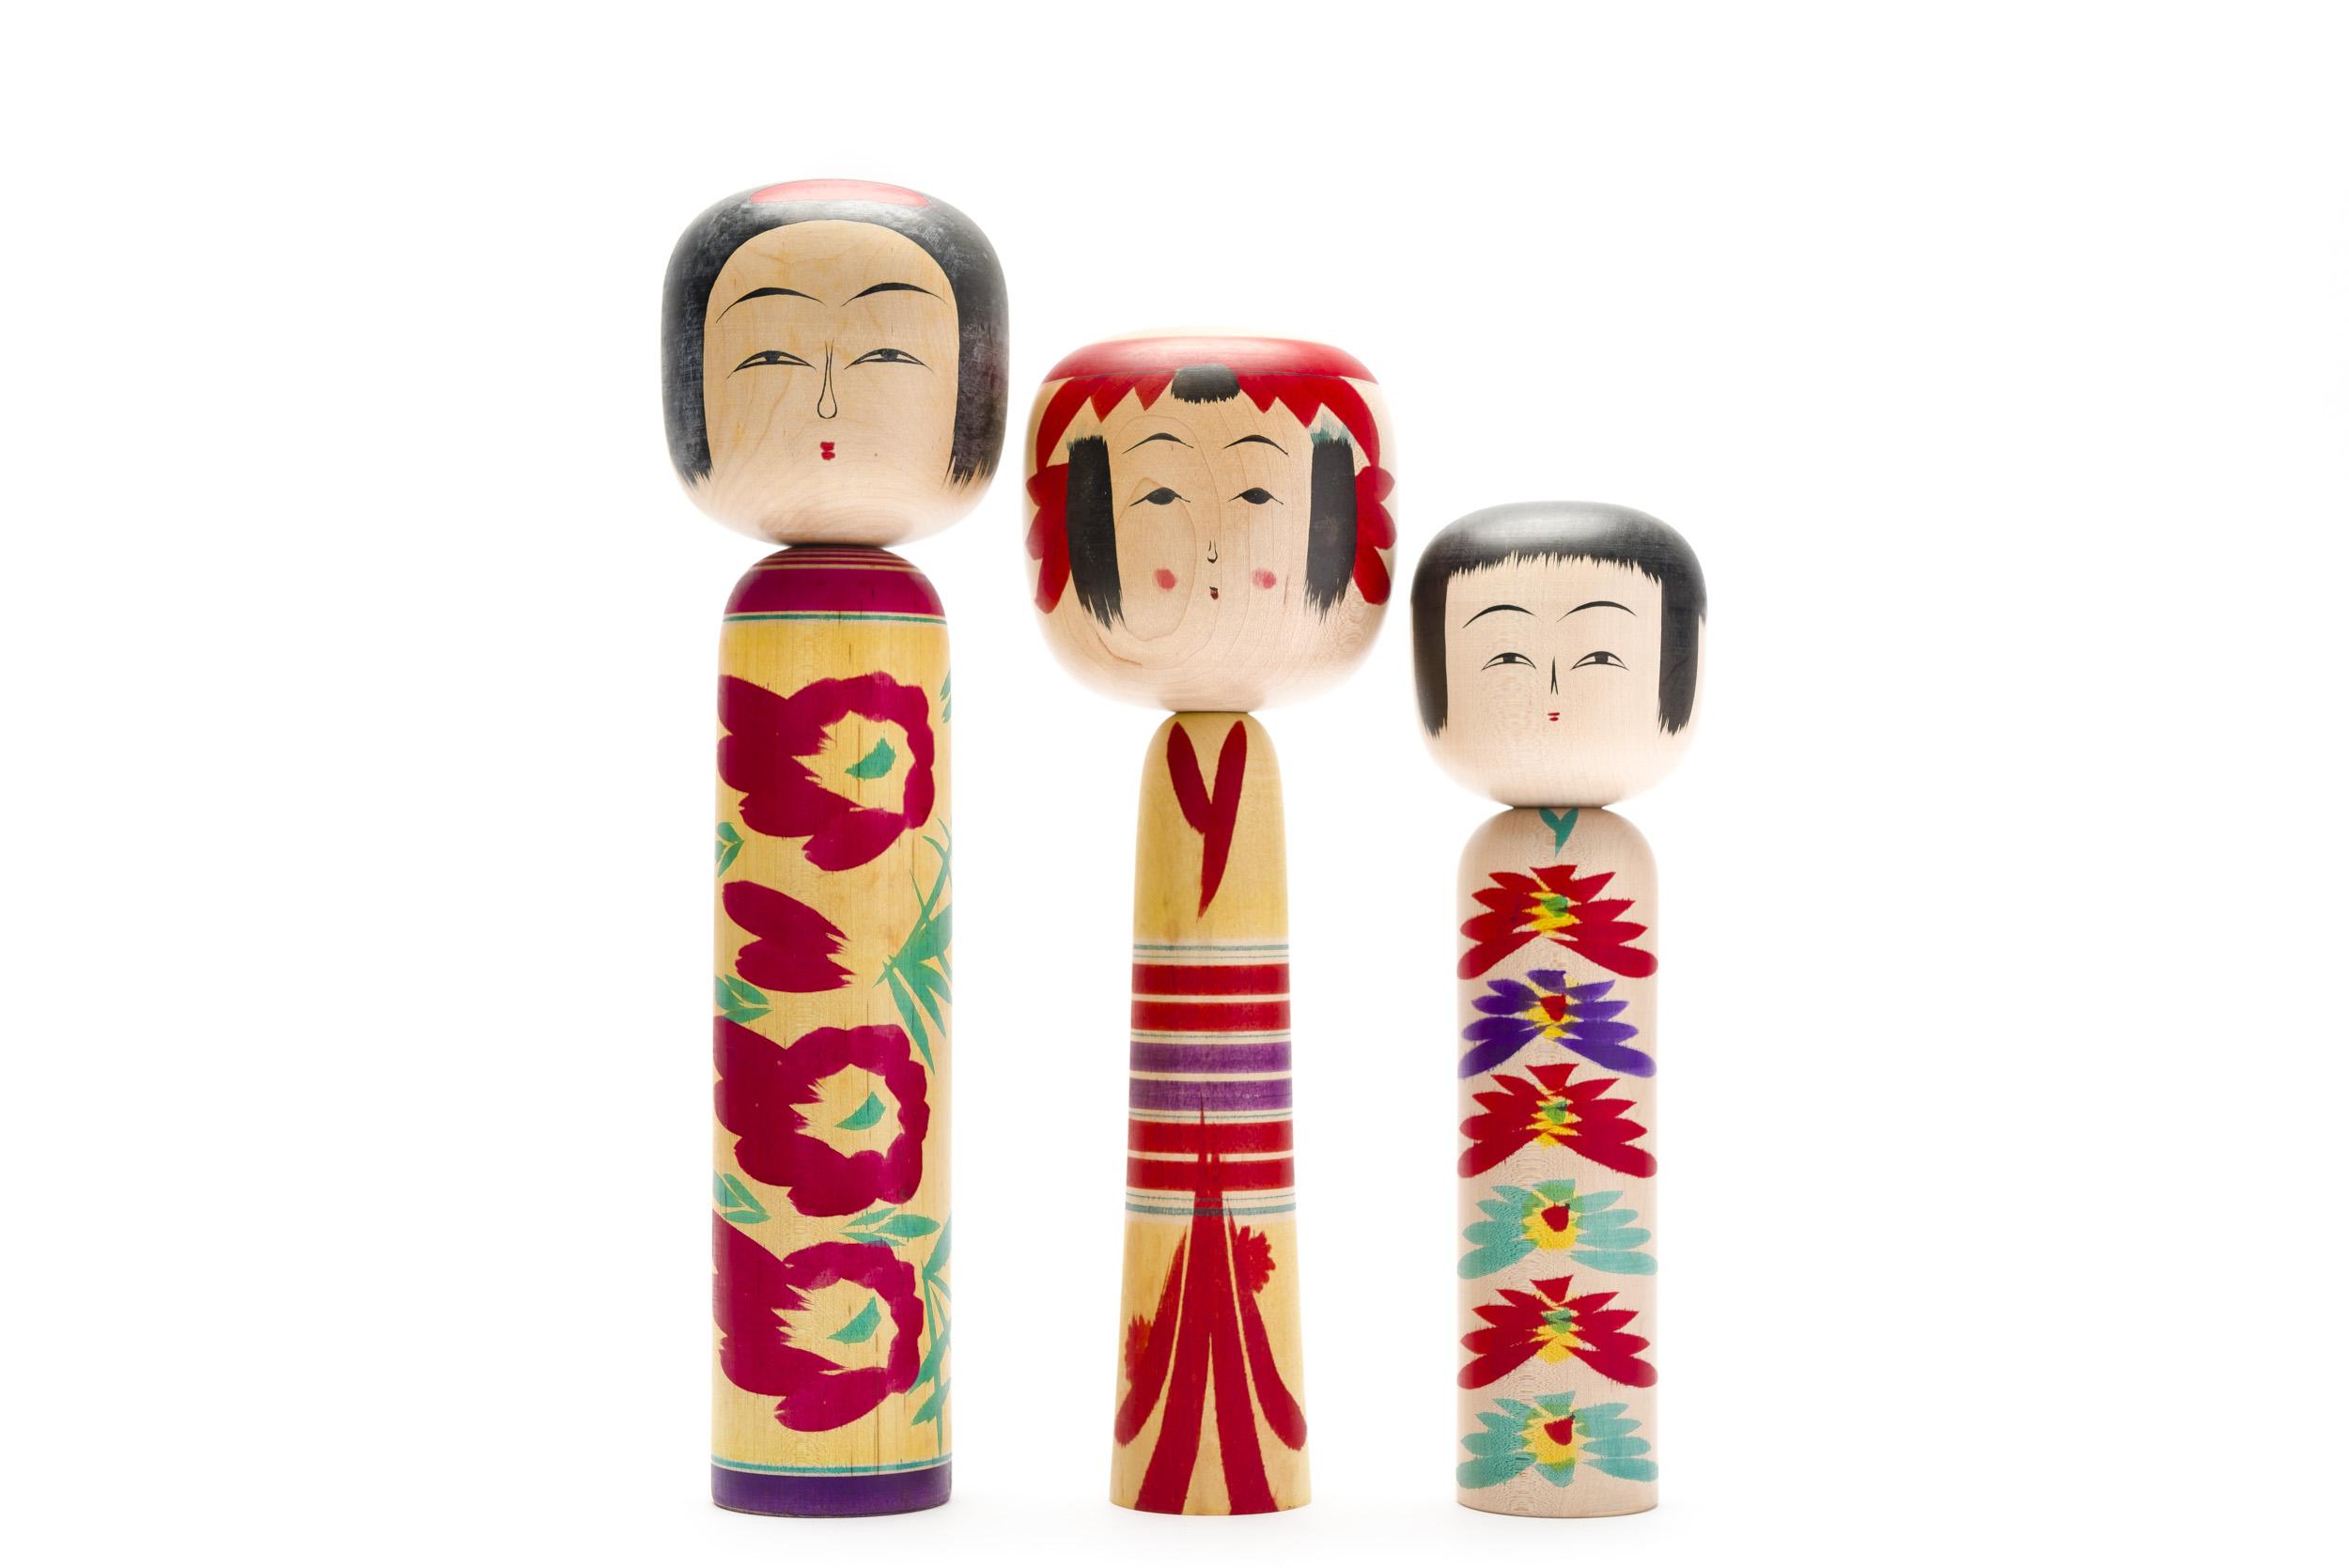 http://www.kameimuseum.or.jp/topics/2015/07/10/%E4%BC%8A%E5%8B%A2%E3%81%93%E3%81%91%E3%81%97%E4%BC%9A%EF%BC%92.jpg